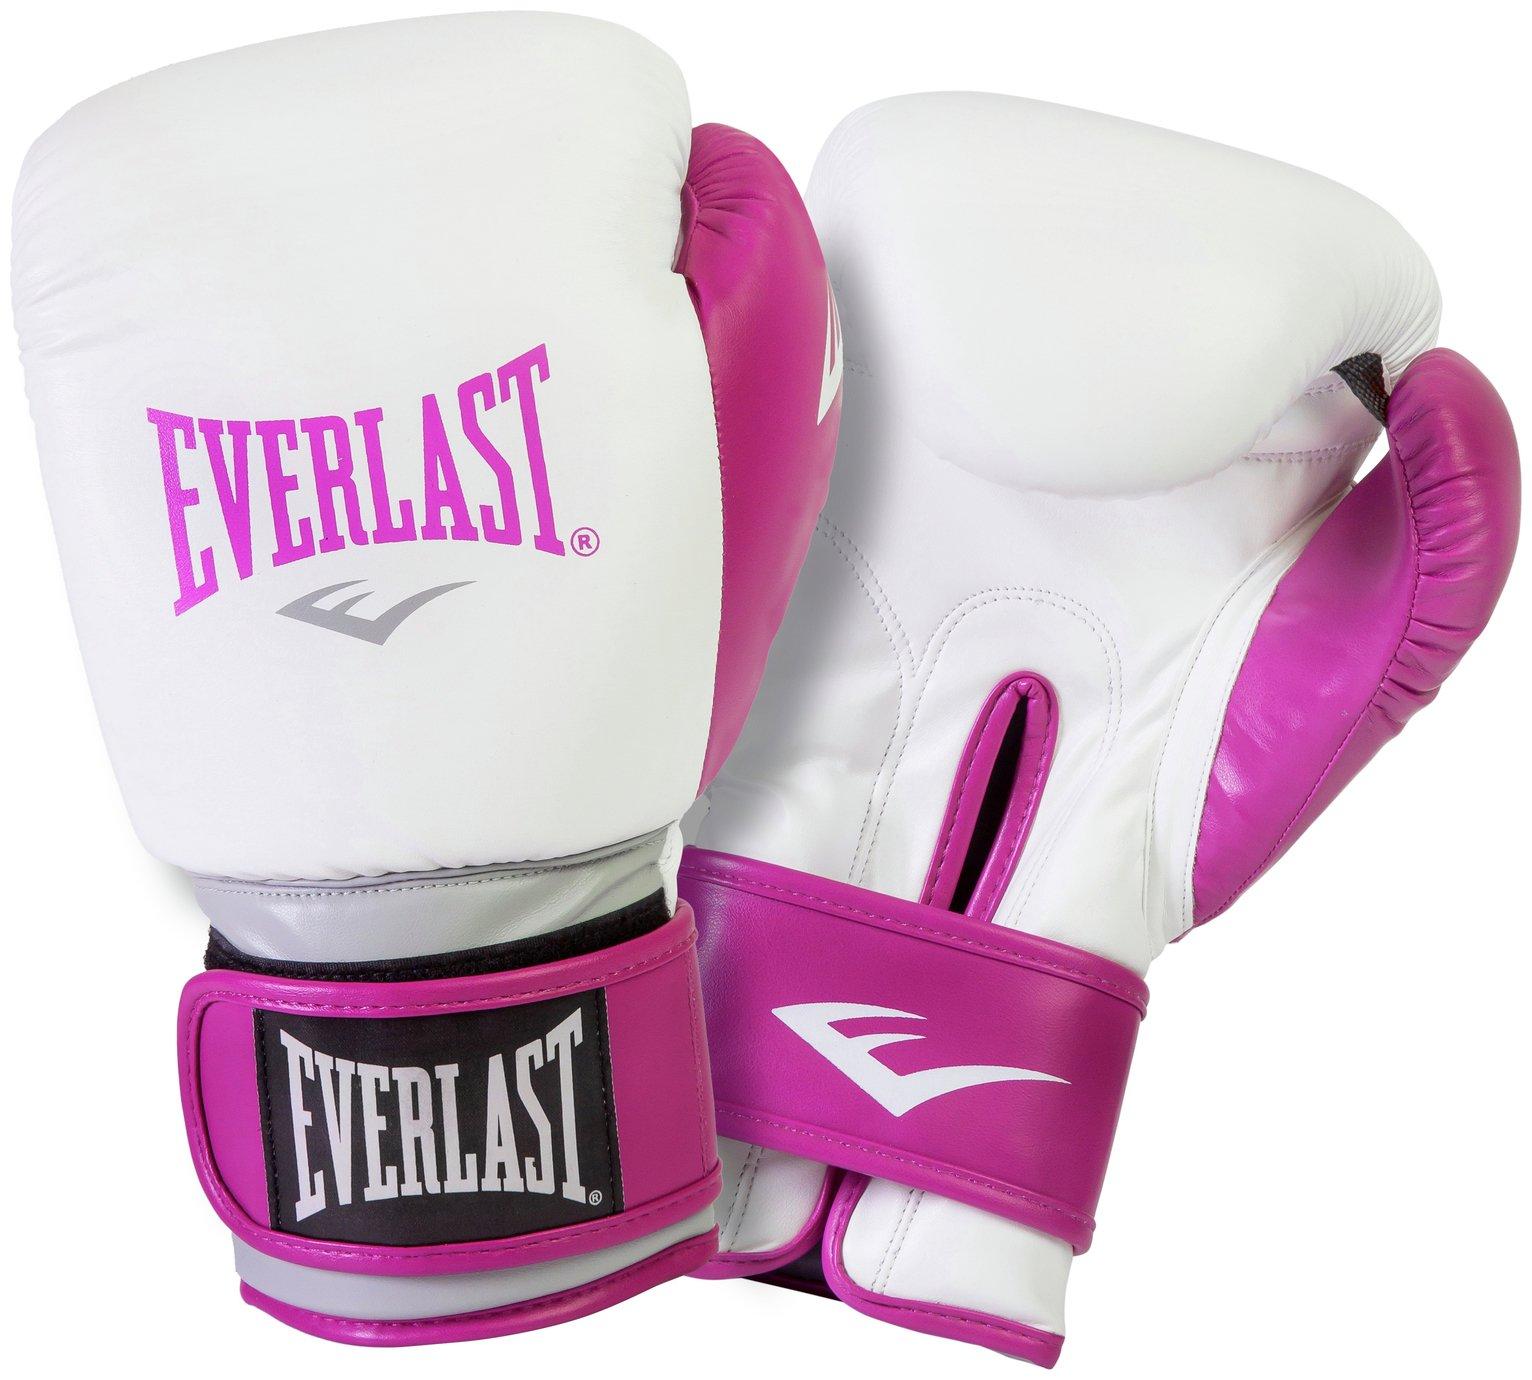 Everlast Women's Boxercise Set lowest price